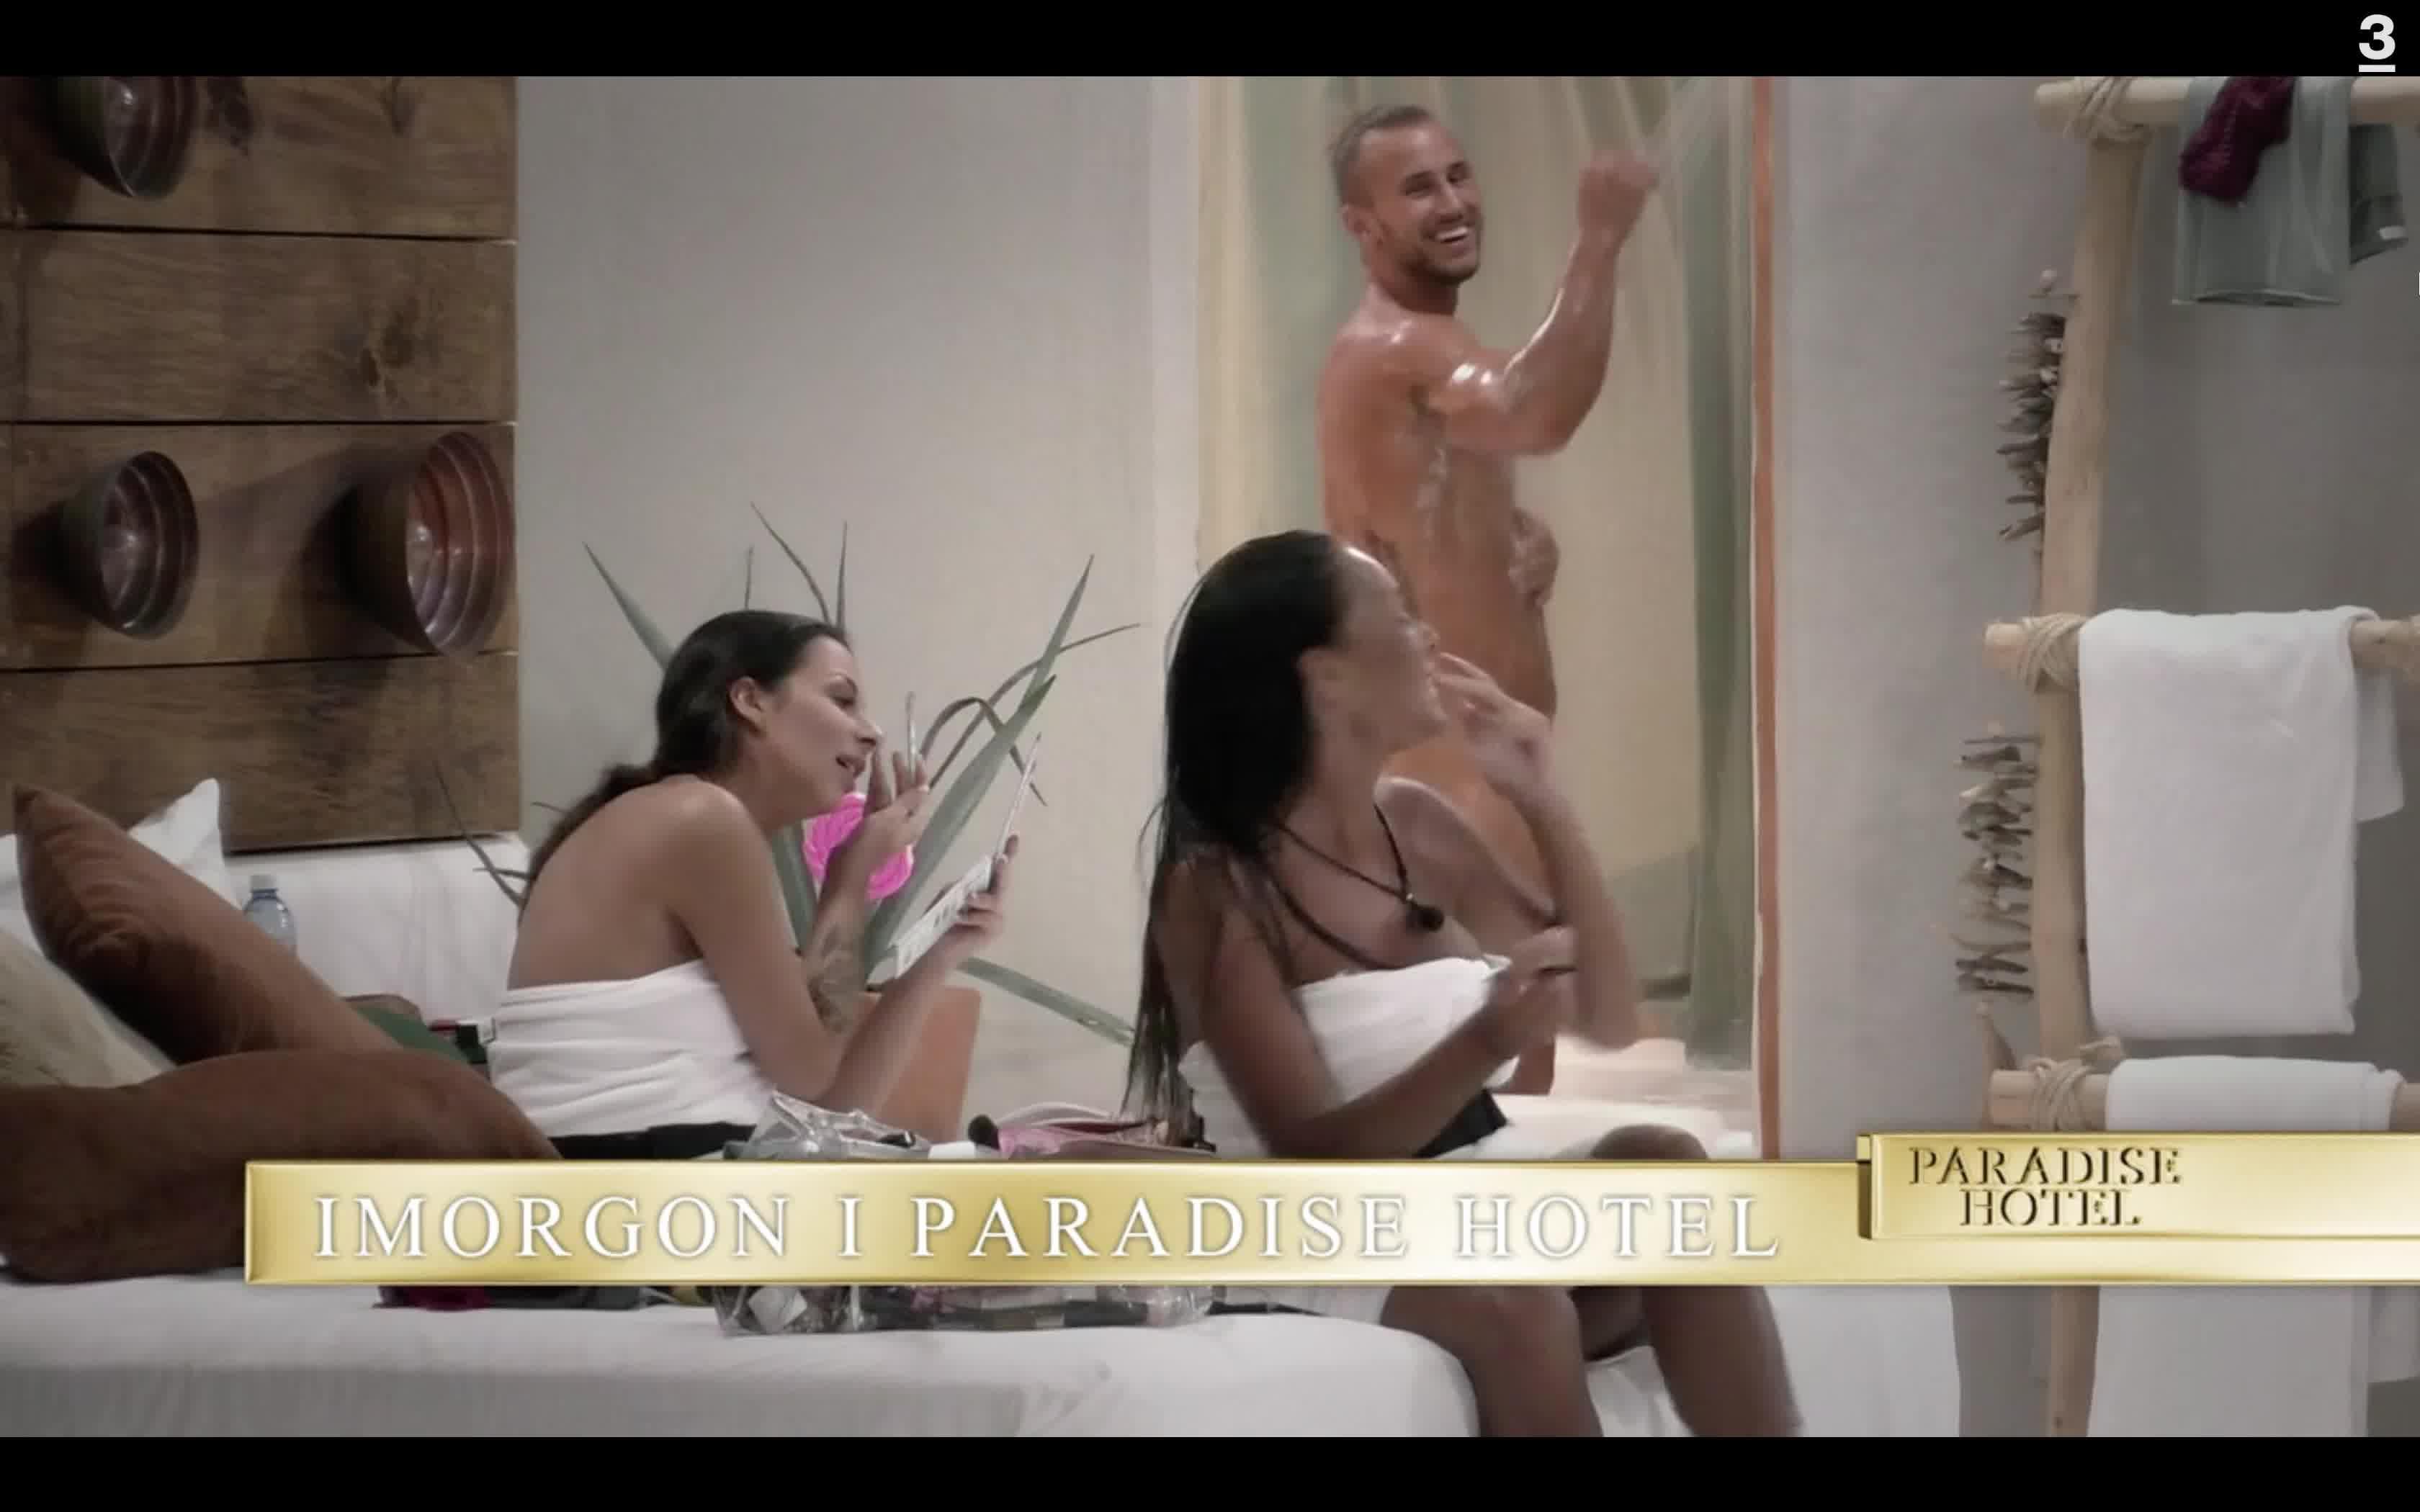 Paradise Hotel 2017 Sexscener Sverige